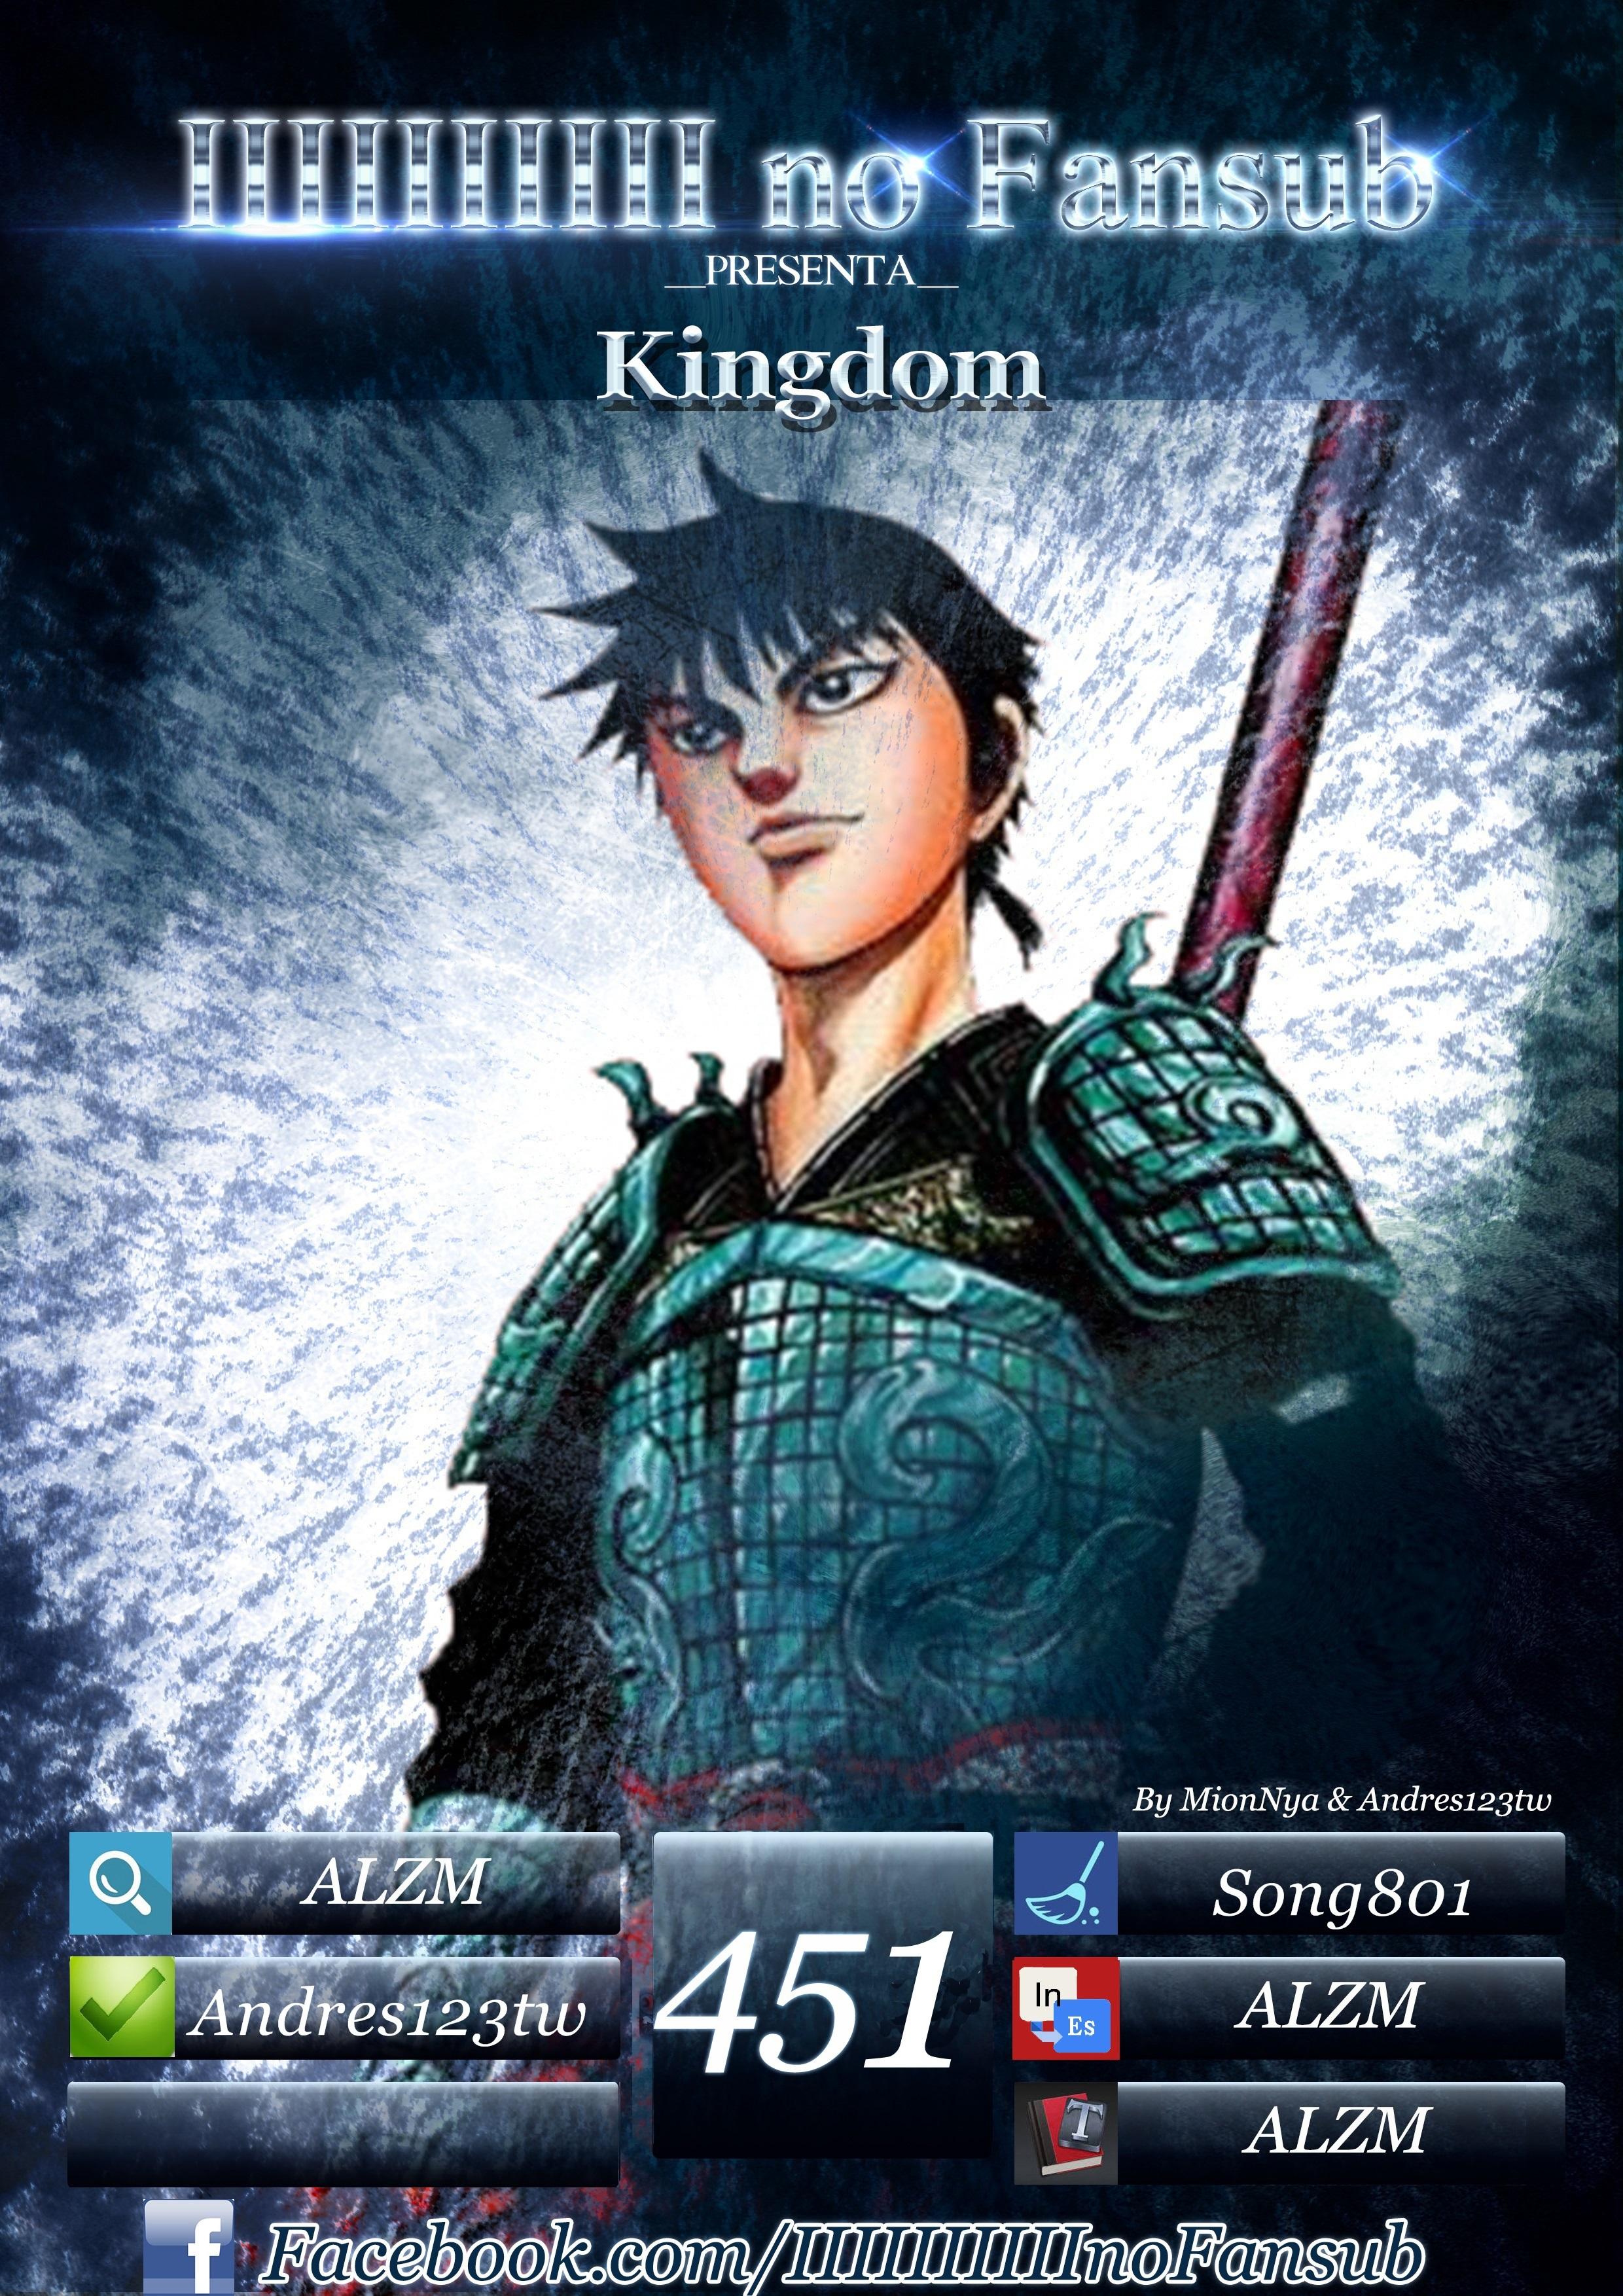 http://c5.ninemanga.com/es_manga/19/12307/429443/d47bf0af618a3523a226ed7cada85ce3.jpg Page 1